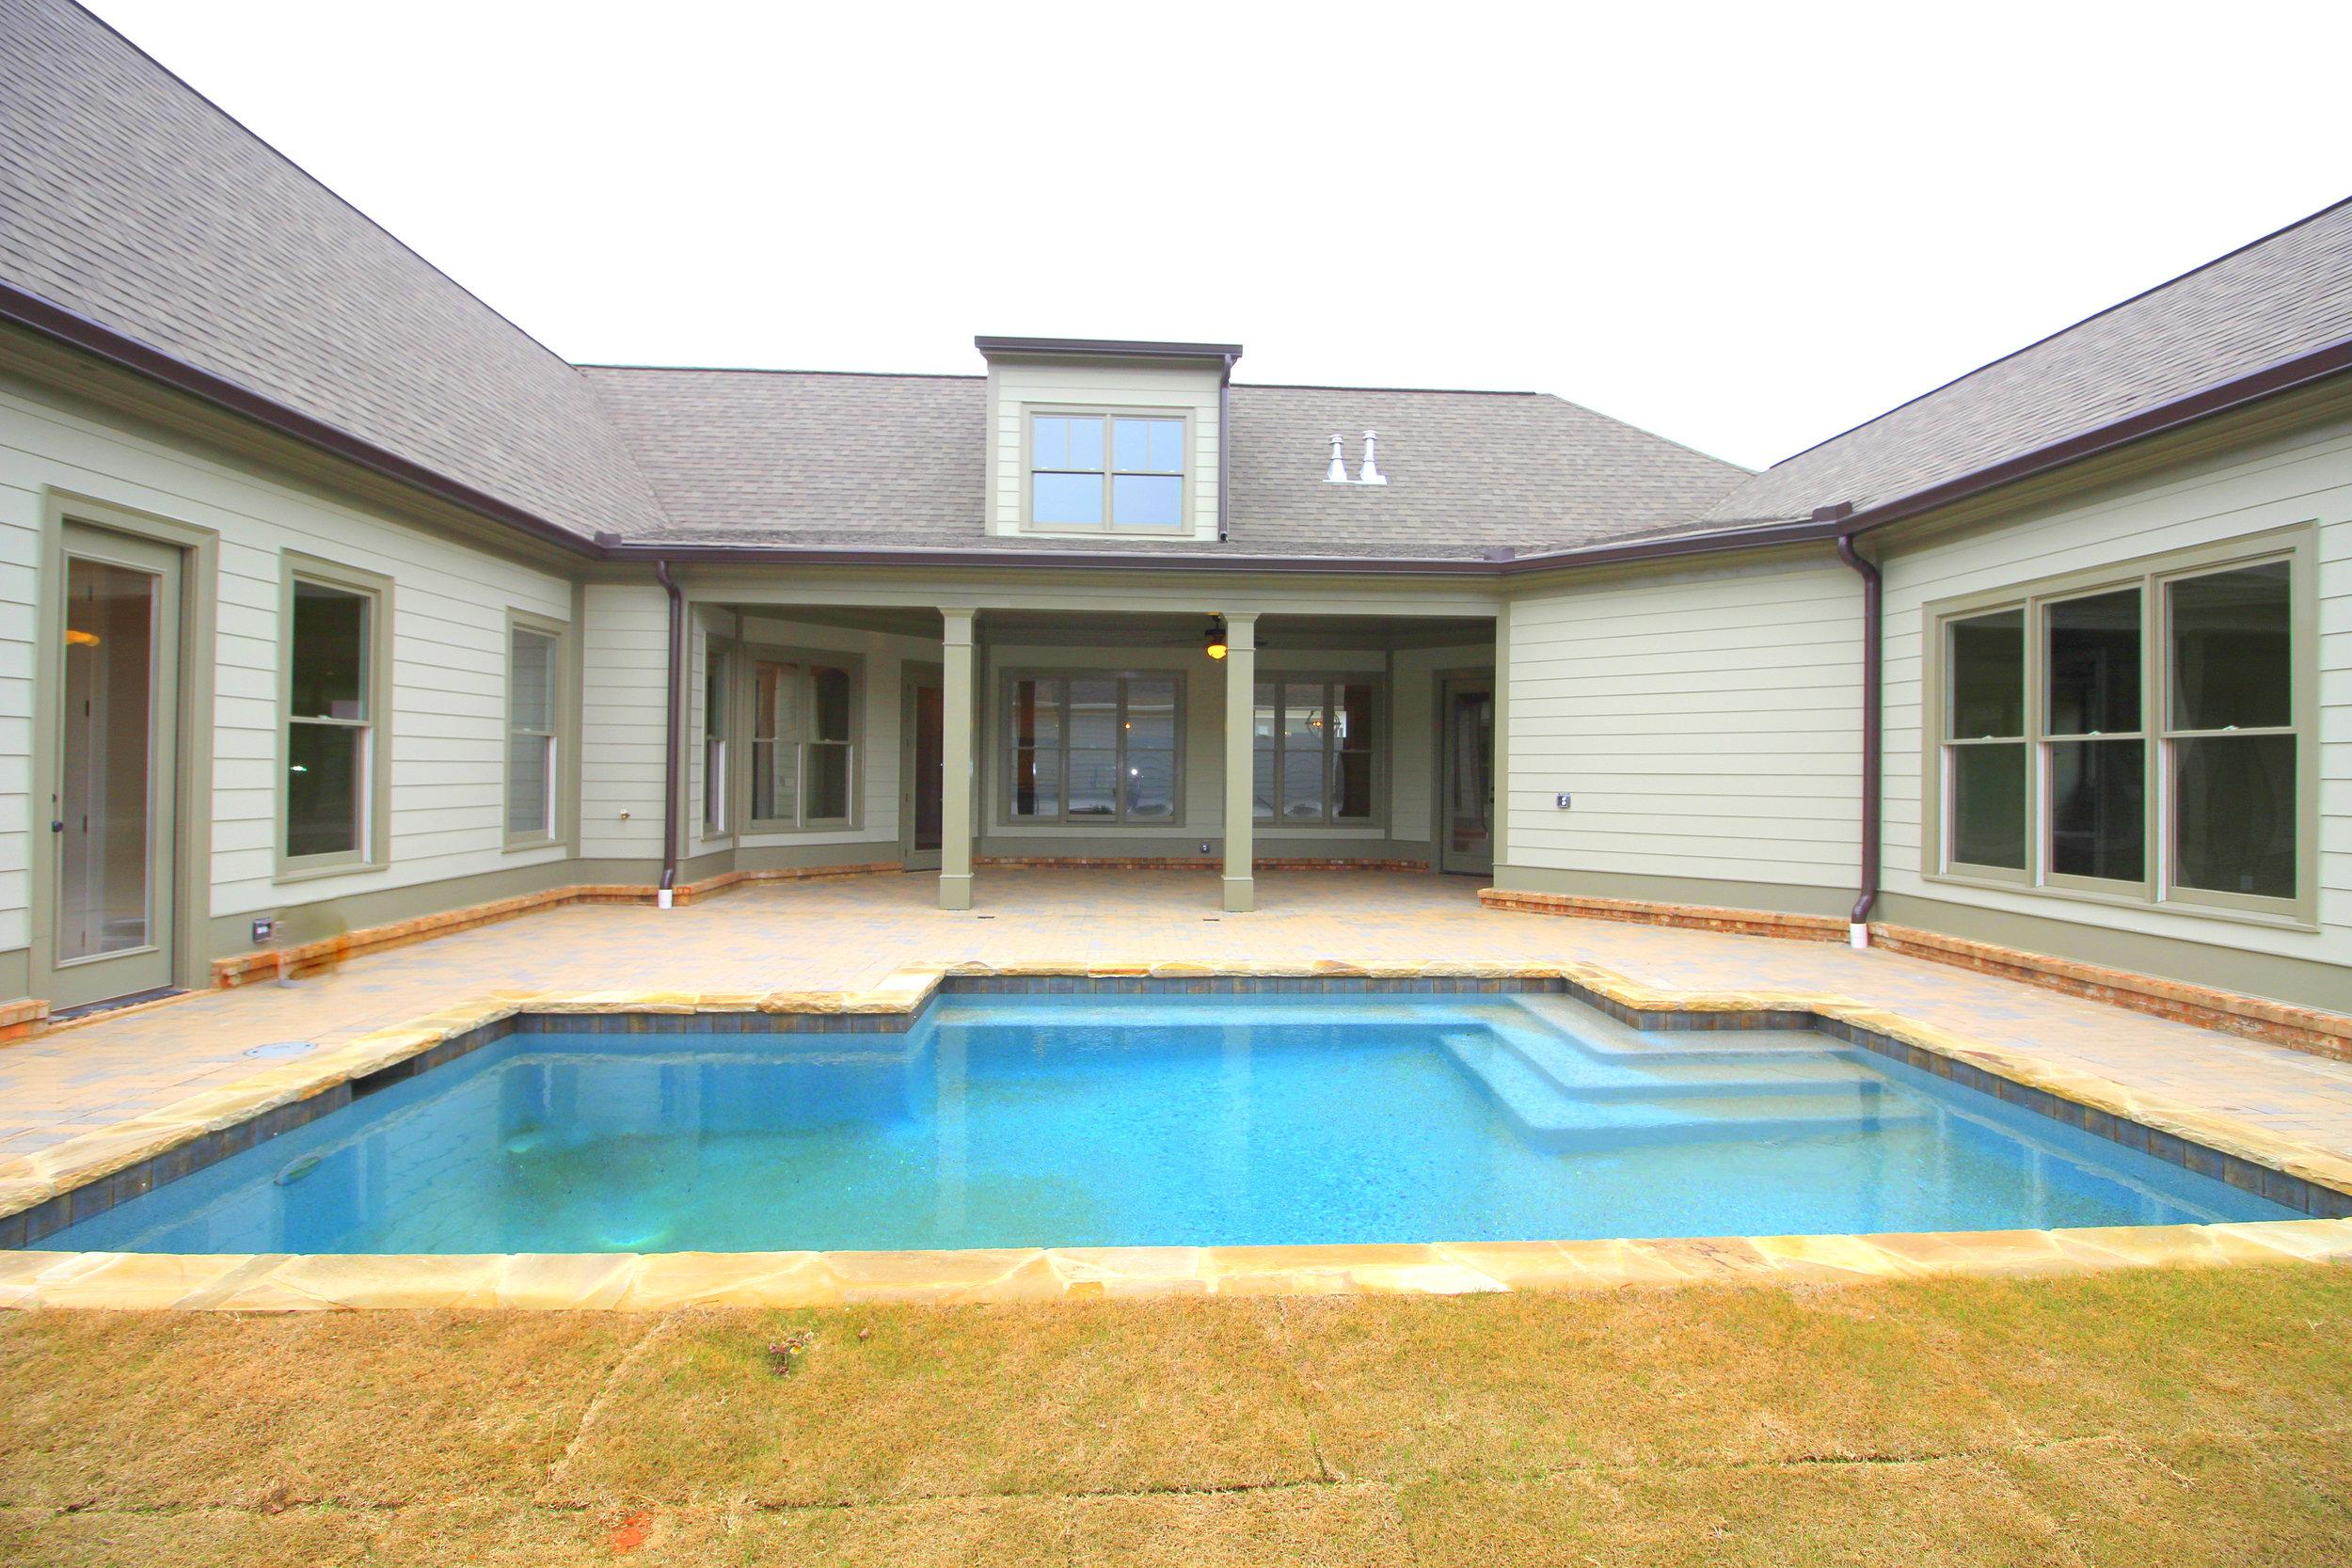 sodded-back-yard-with-pool-1756-greenleffe-drive-statham-ga-30666-the-georgia-club-oconee-county-oconee-springs-athens-area-home-for-sale-courtyard-homes.JPG